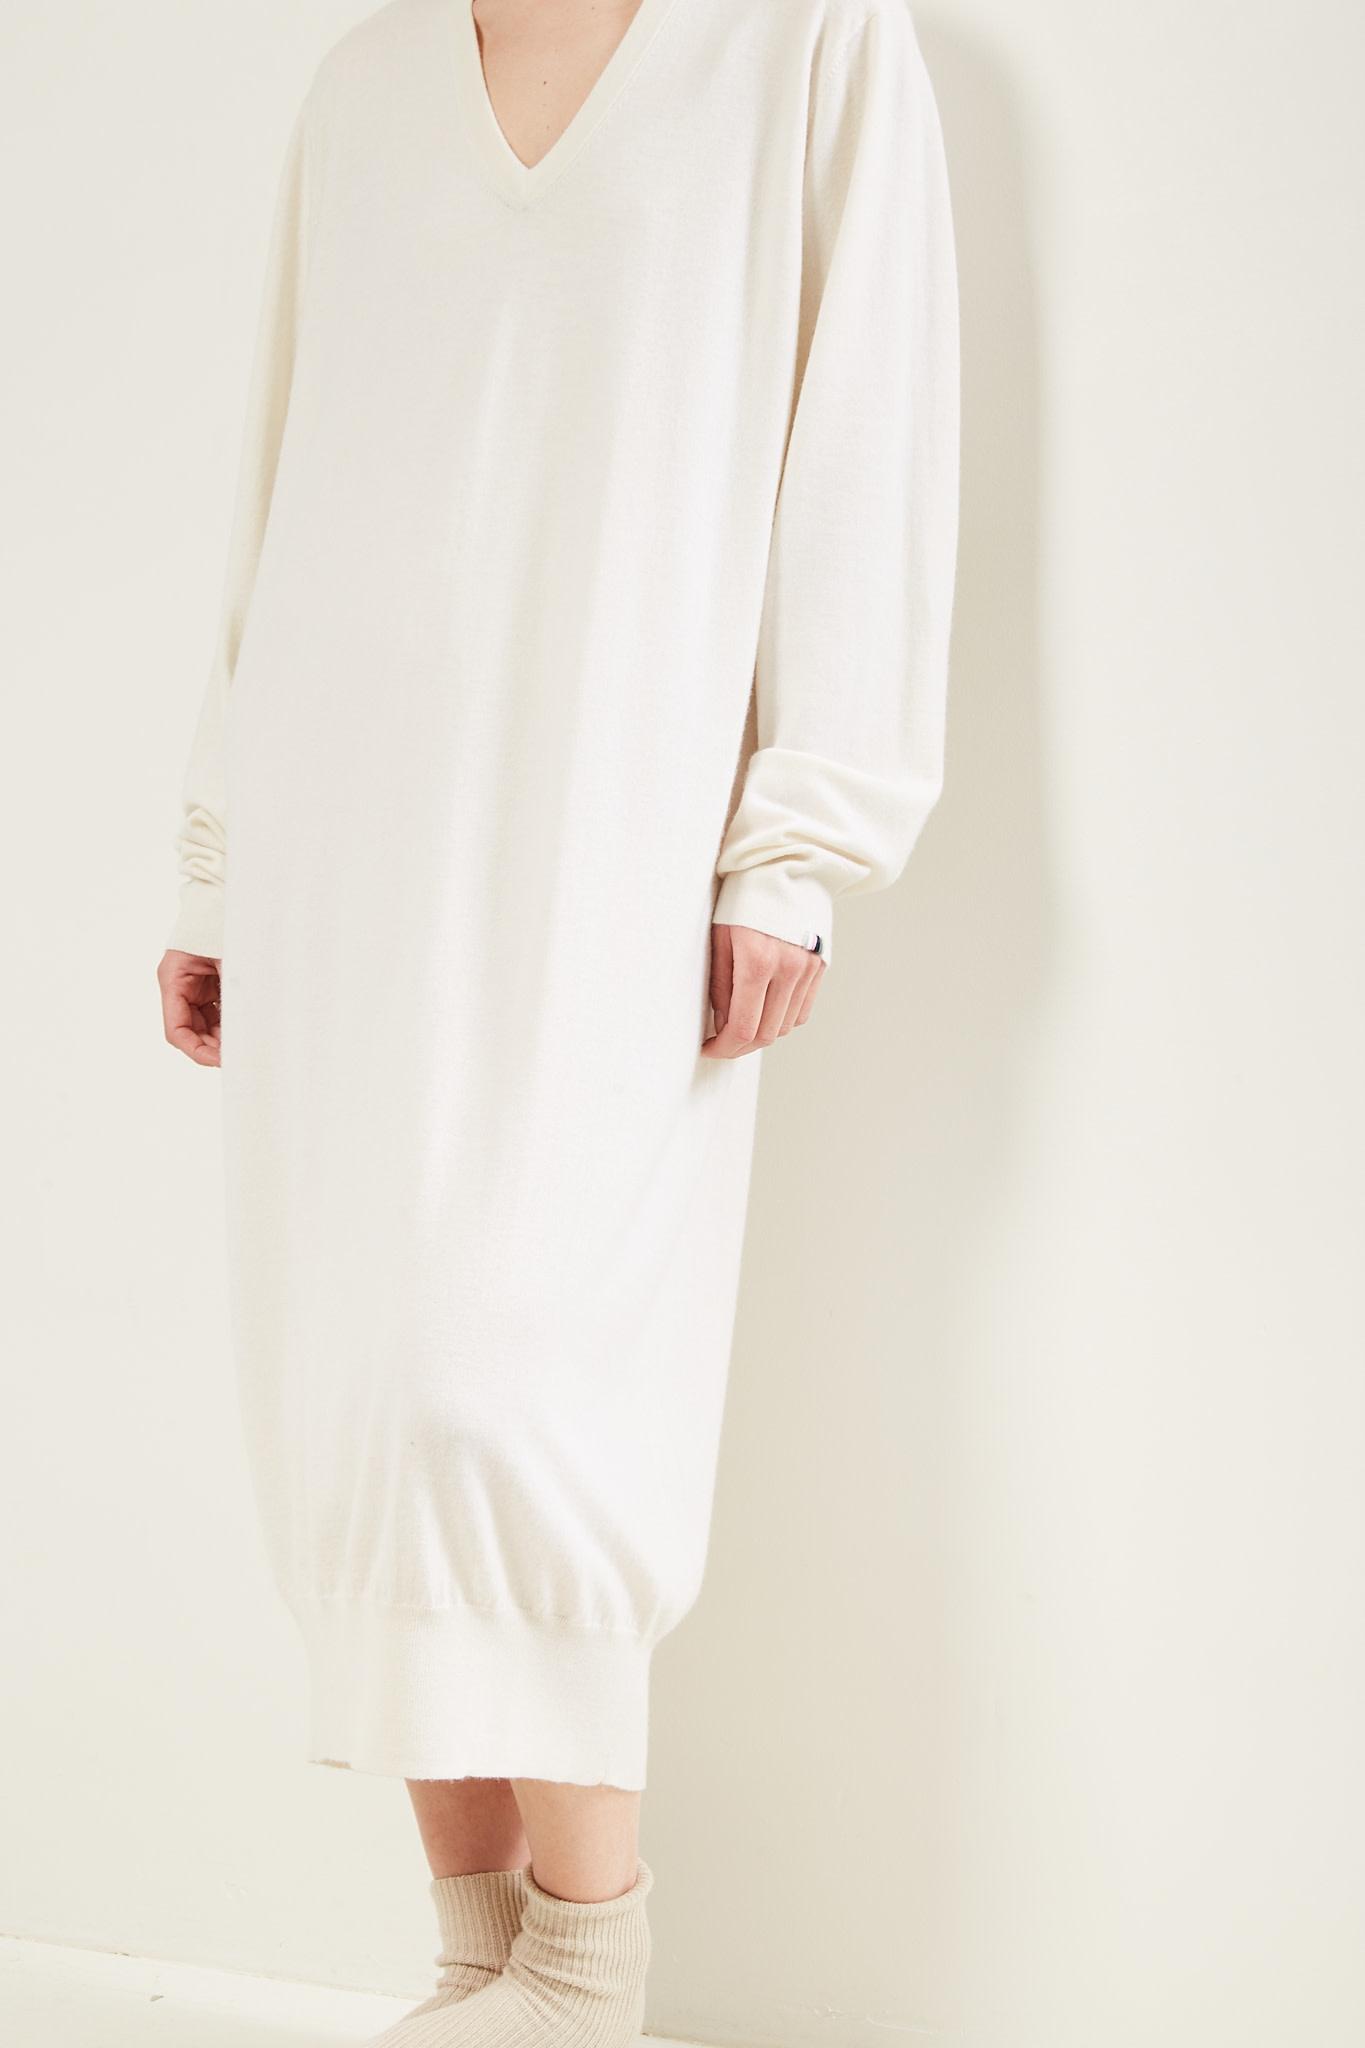 extreme cashmere - Martin v neck dress